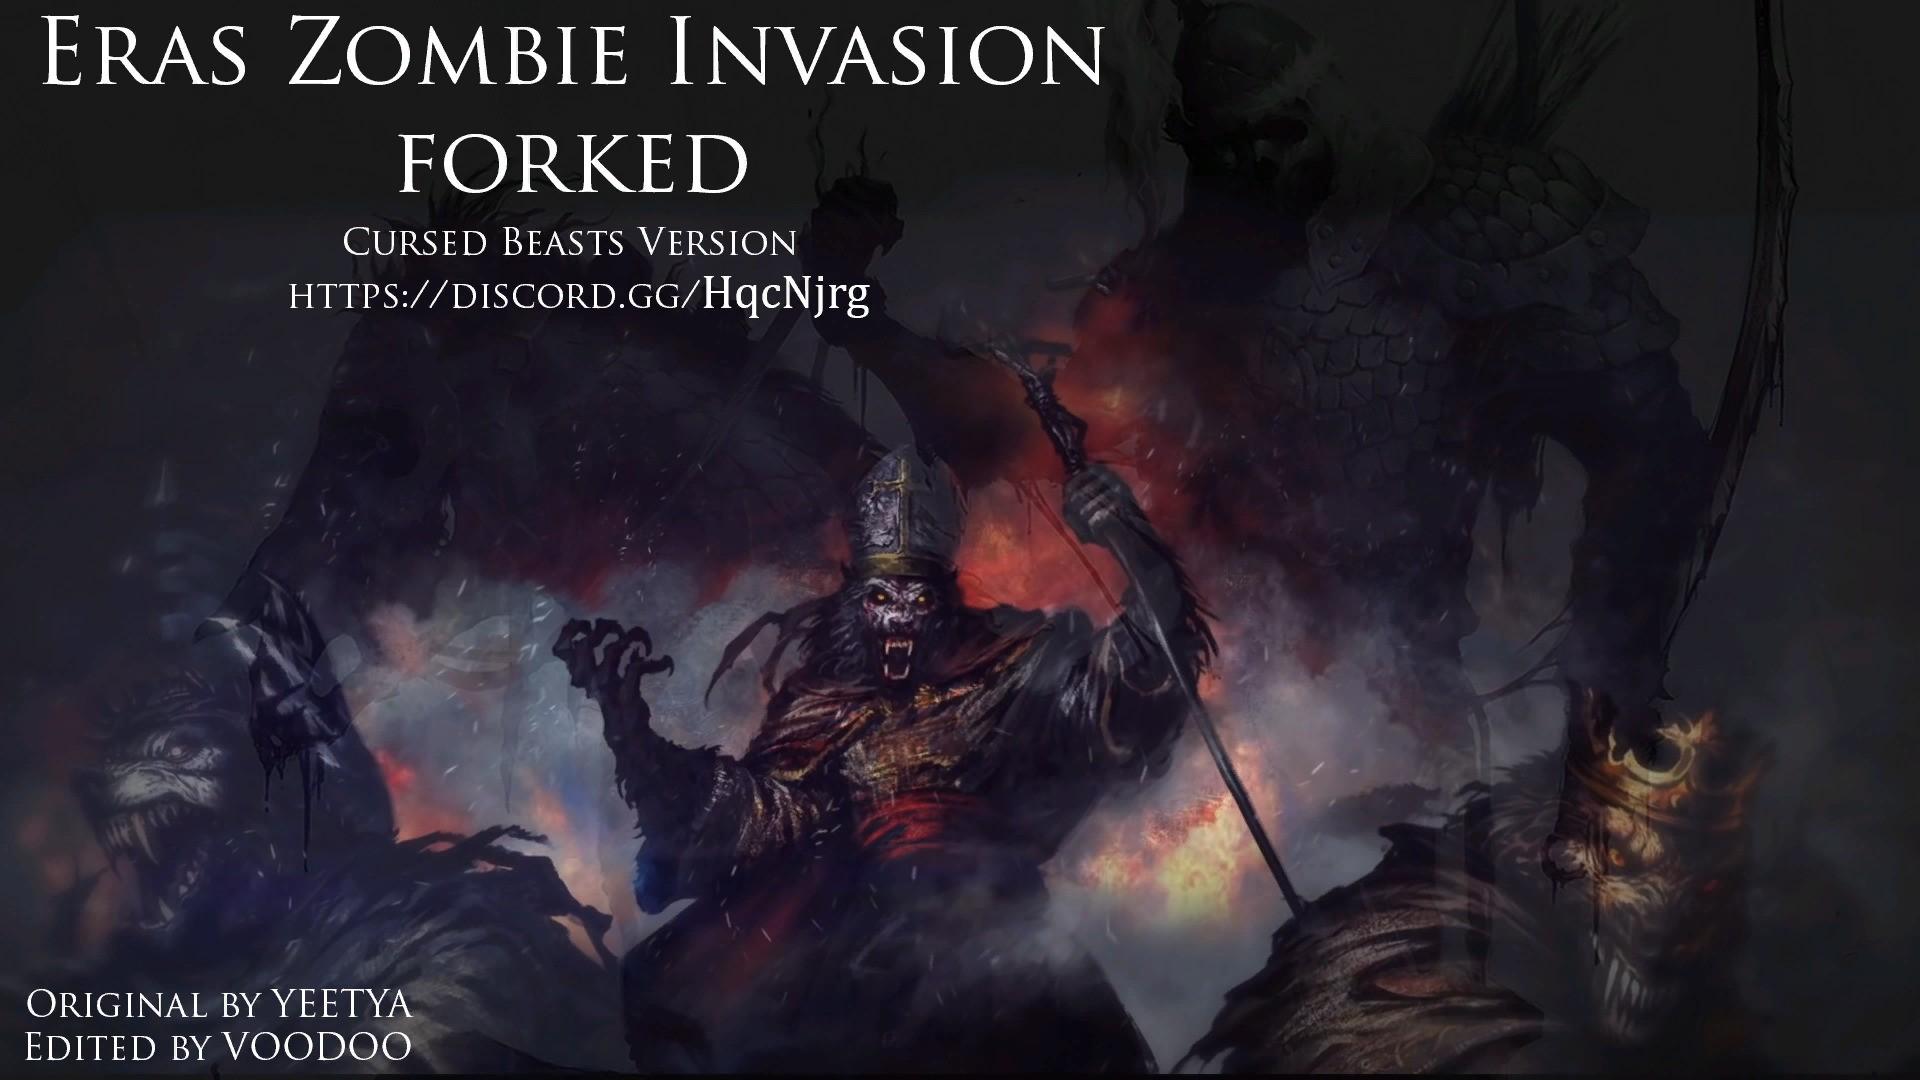 Eras Zombie Invasion Forked 1.1b 24p - Warcraft 3: Custom Map avatar